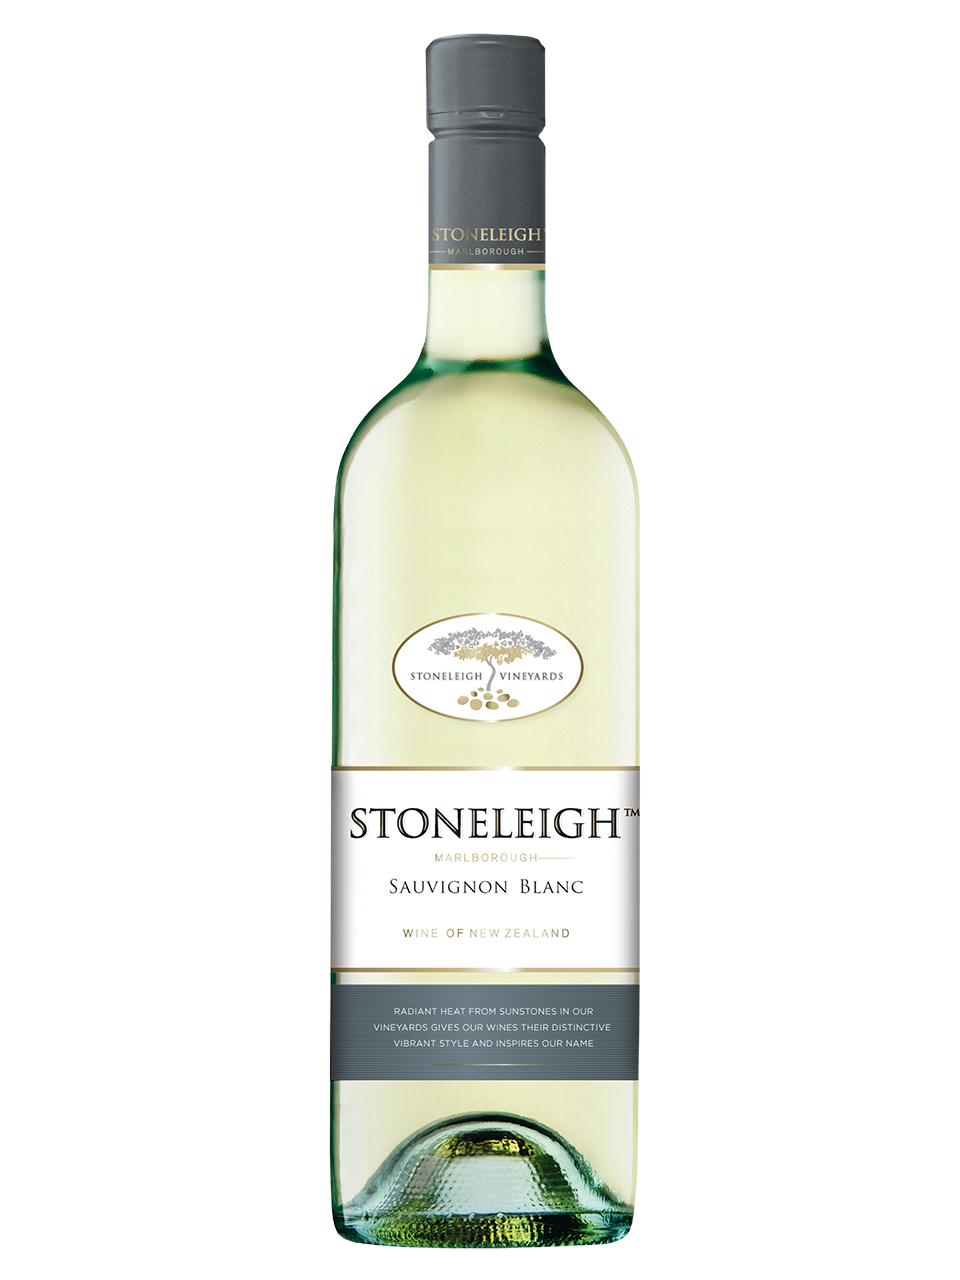 Stoneleigh Marlborough Sauvignon Blanc